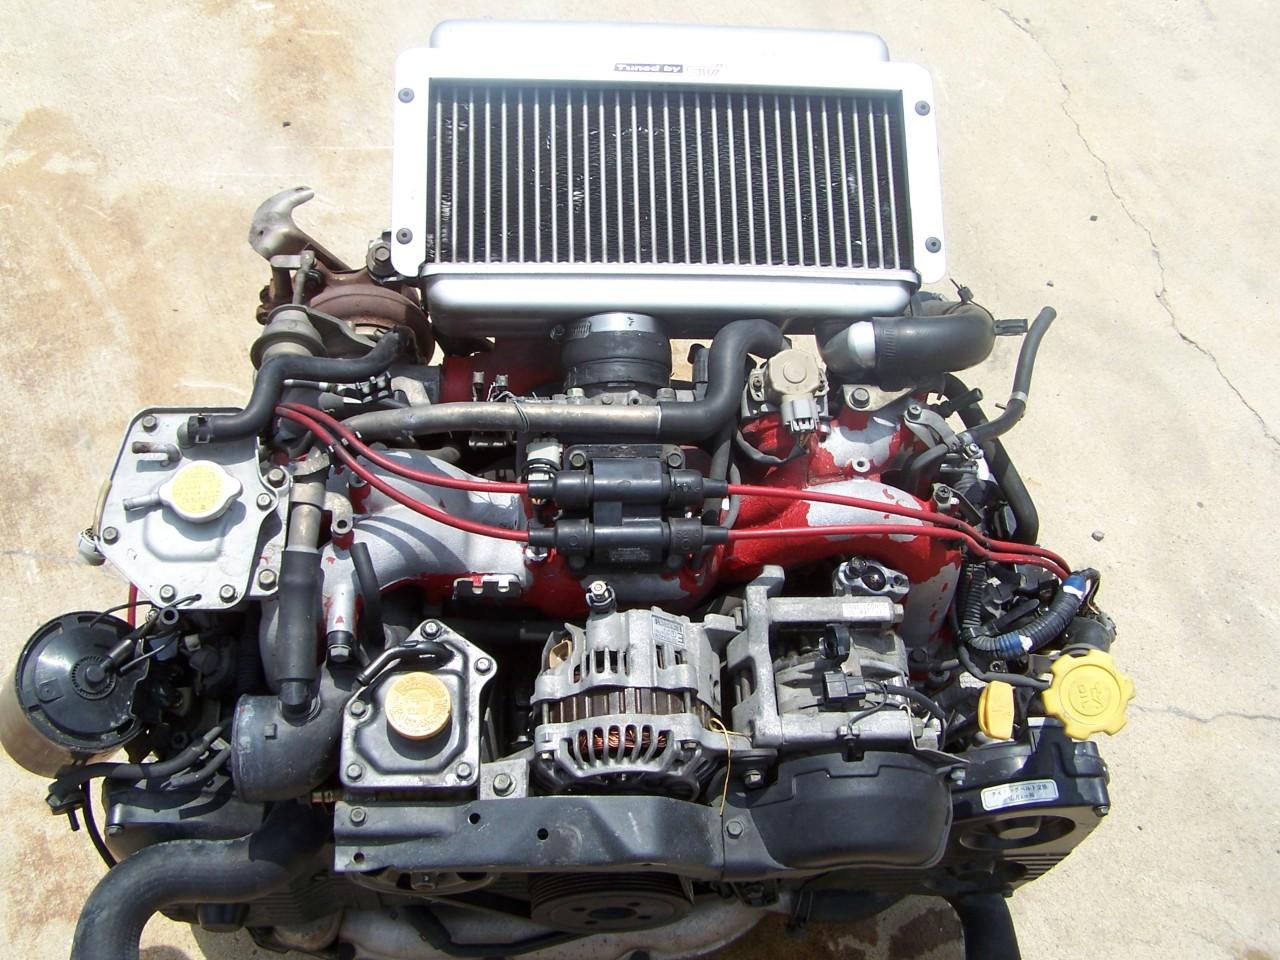 Jdm Subaru Impreza Wrx Sti Ej20 Turbo Engine Ver6 97 Wiring Diagram Gc8 Rs Forum Community